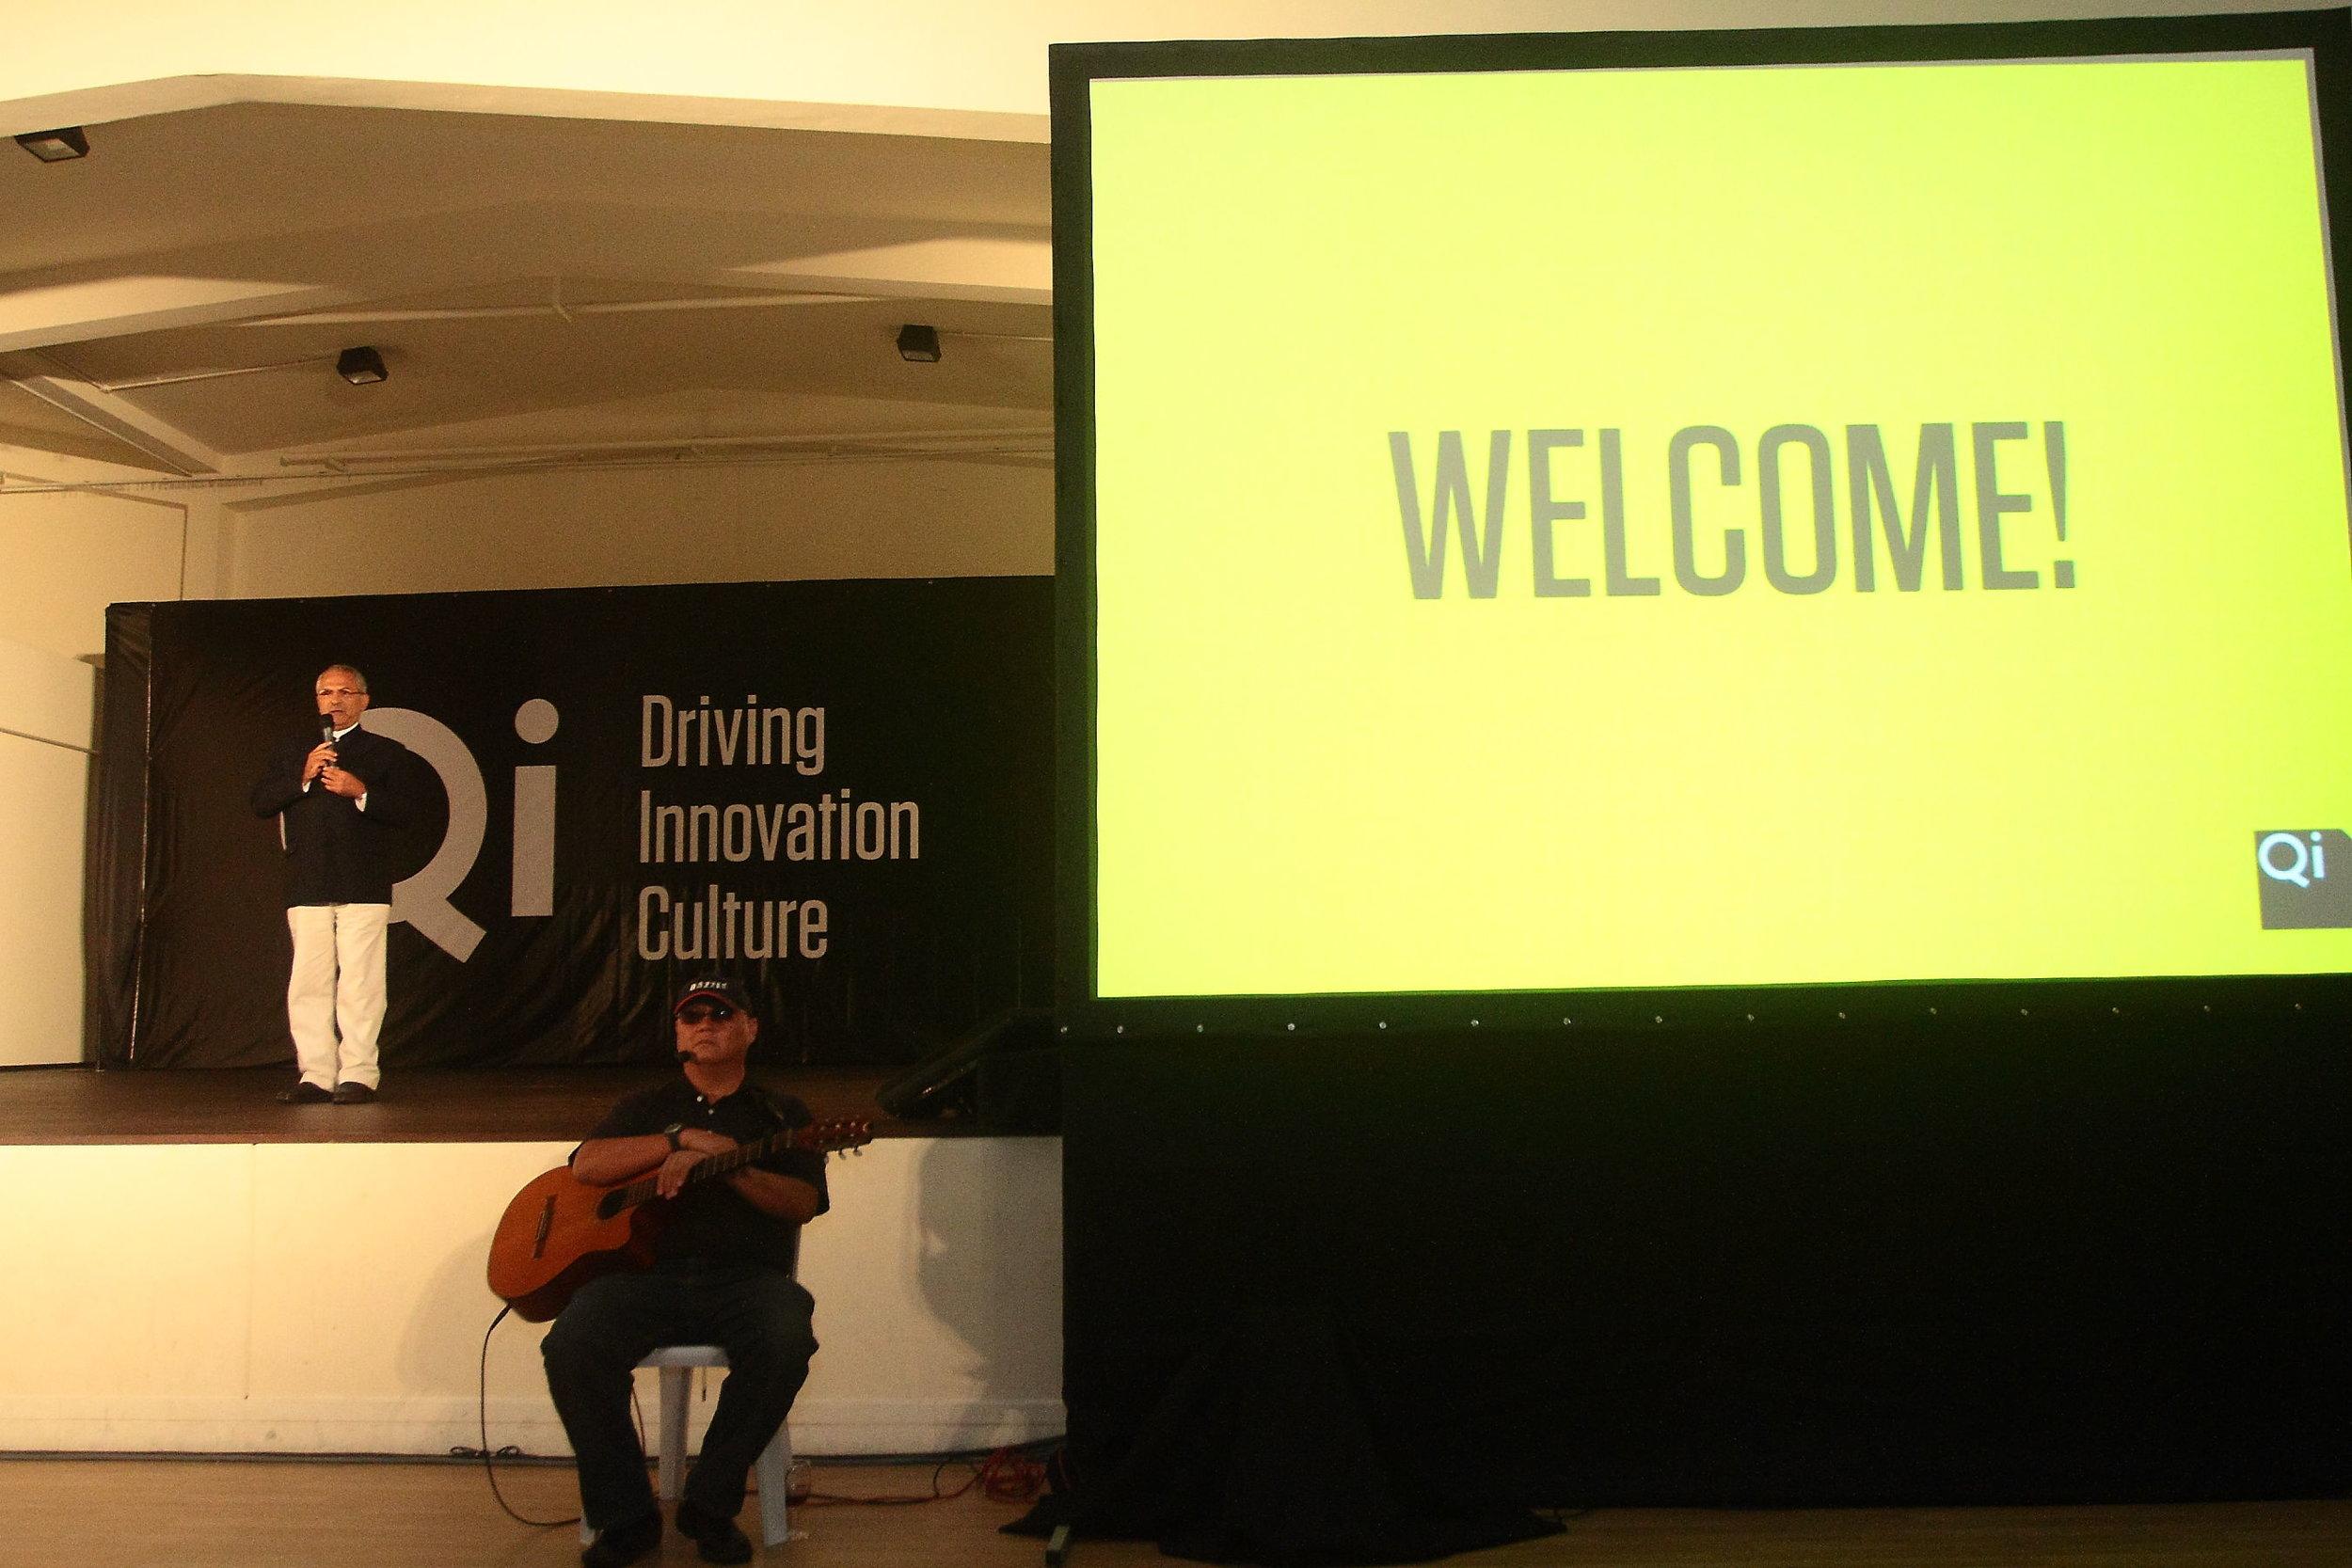 qi-global-2011-driving-innovation-culture-032.jpg